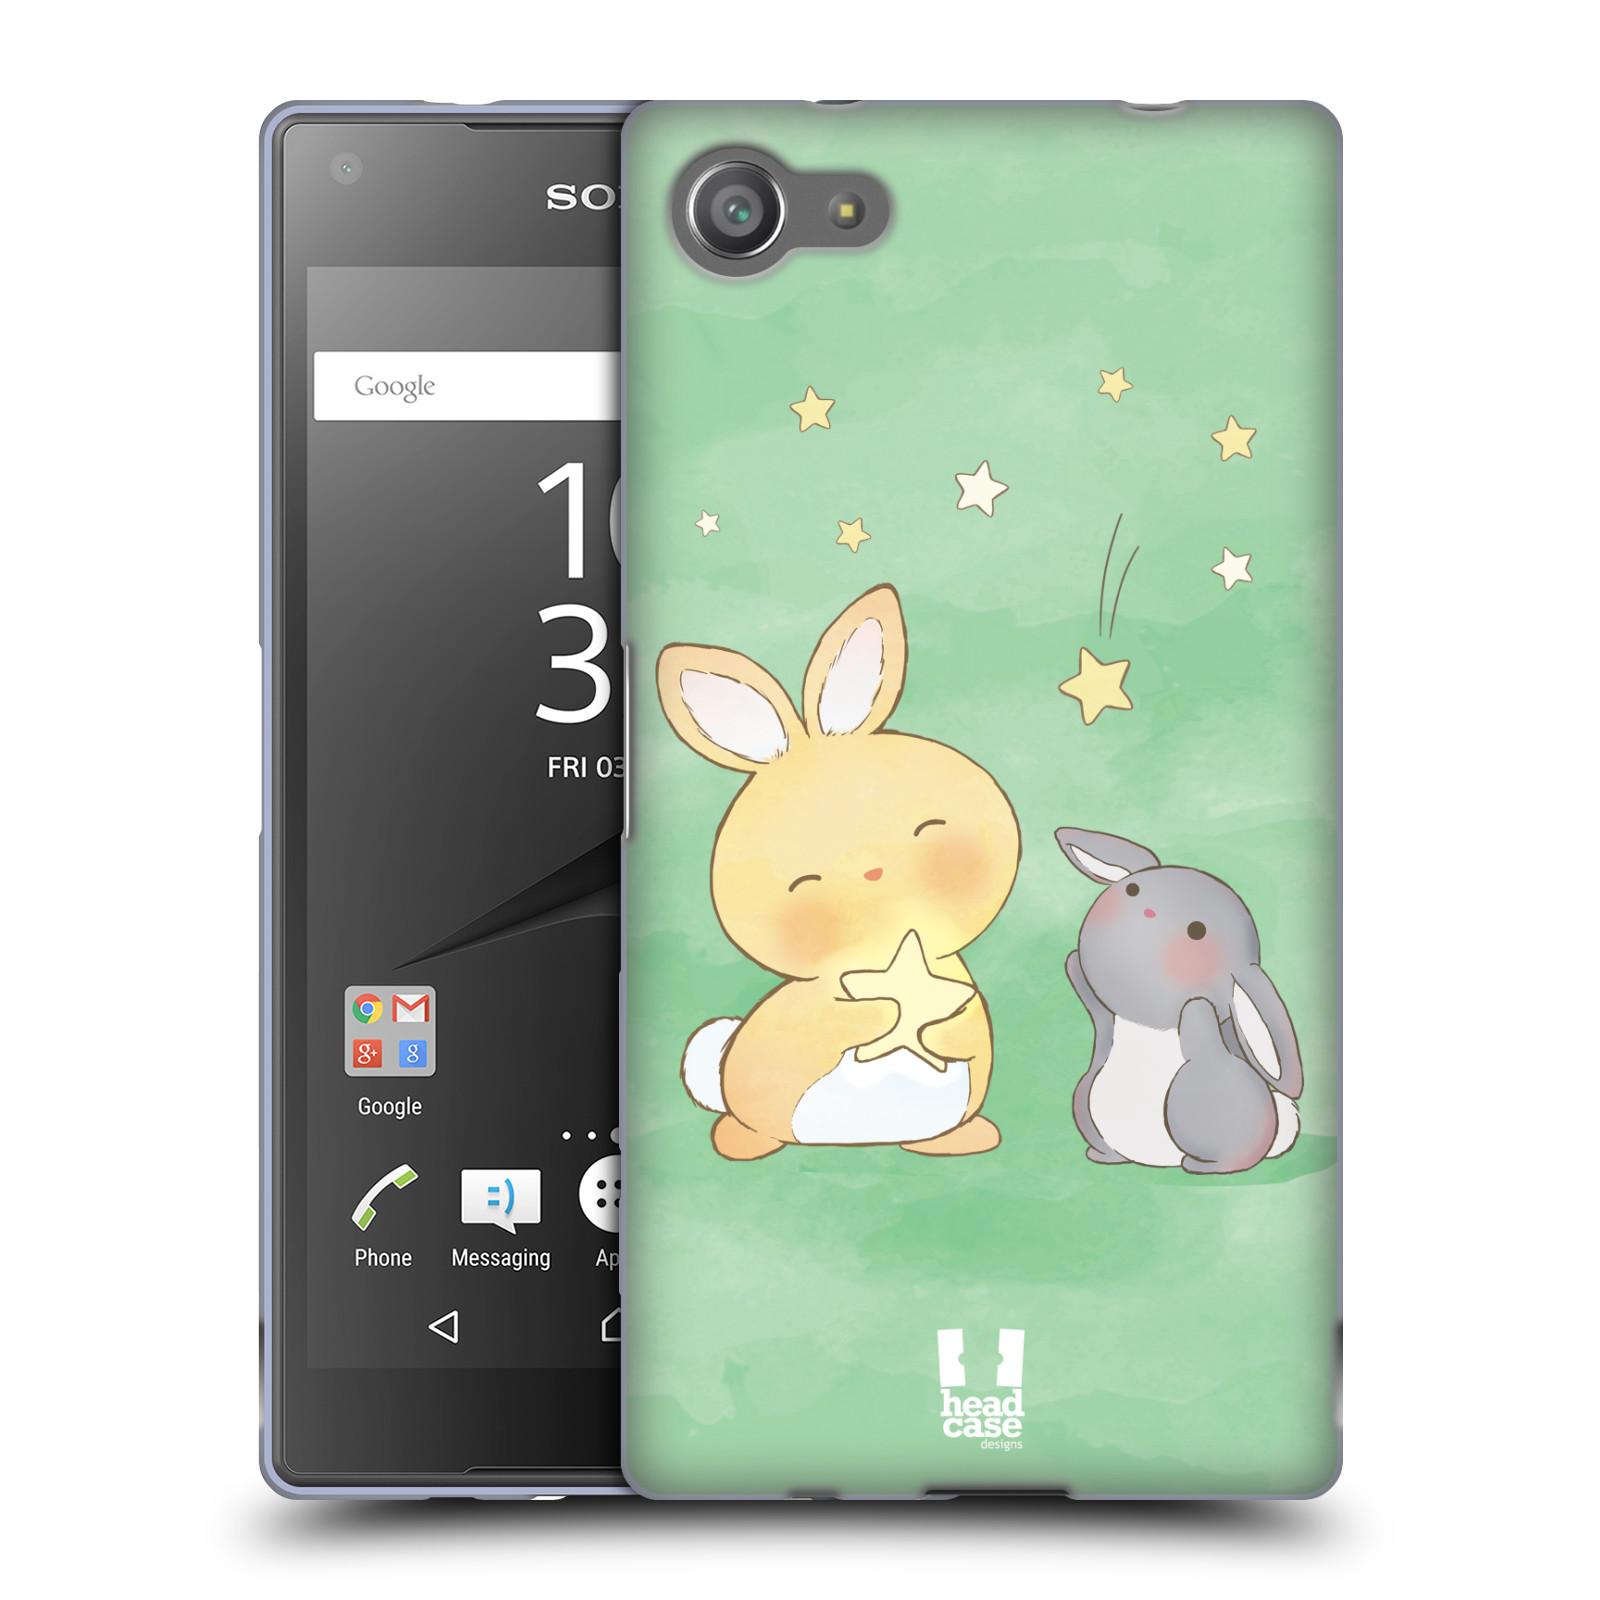 HEAD CASE silikonový obal na mobil Sony Xperia Z5 COMPACT vzor králíček a hvězdy zelená